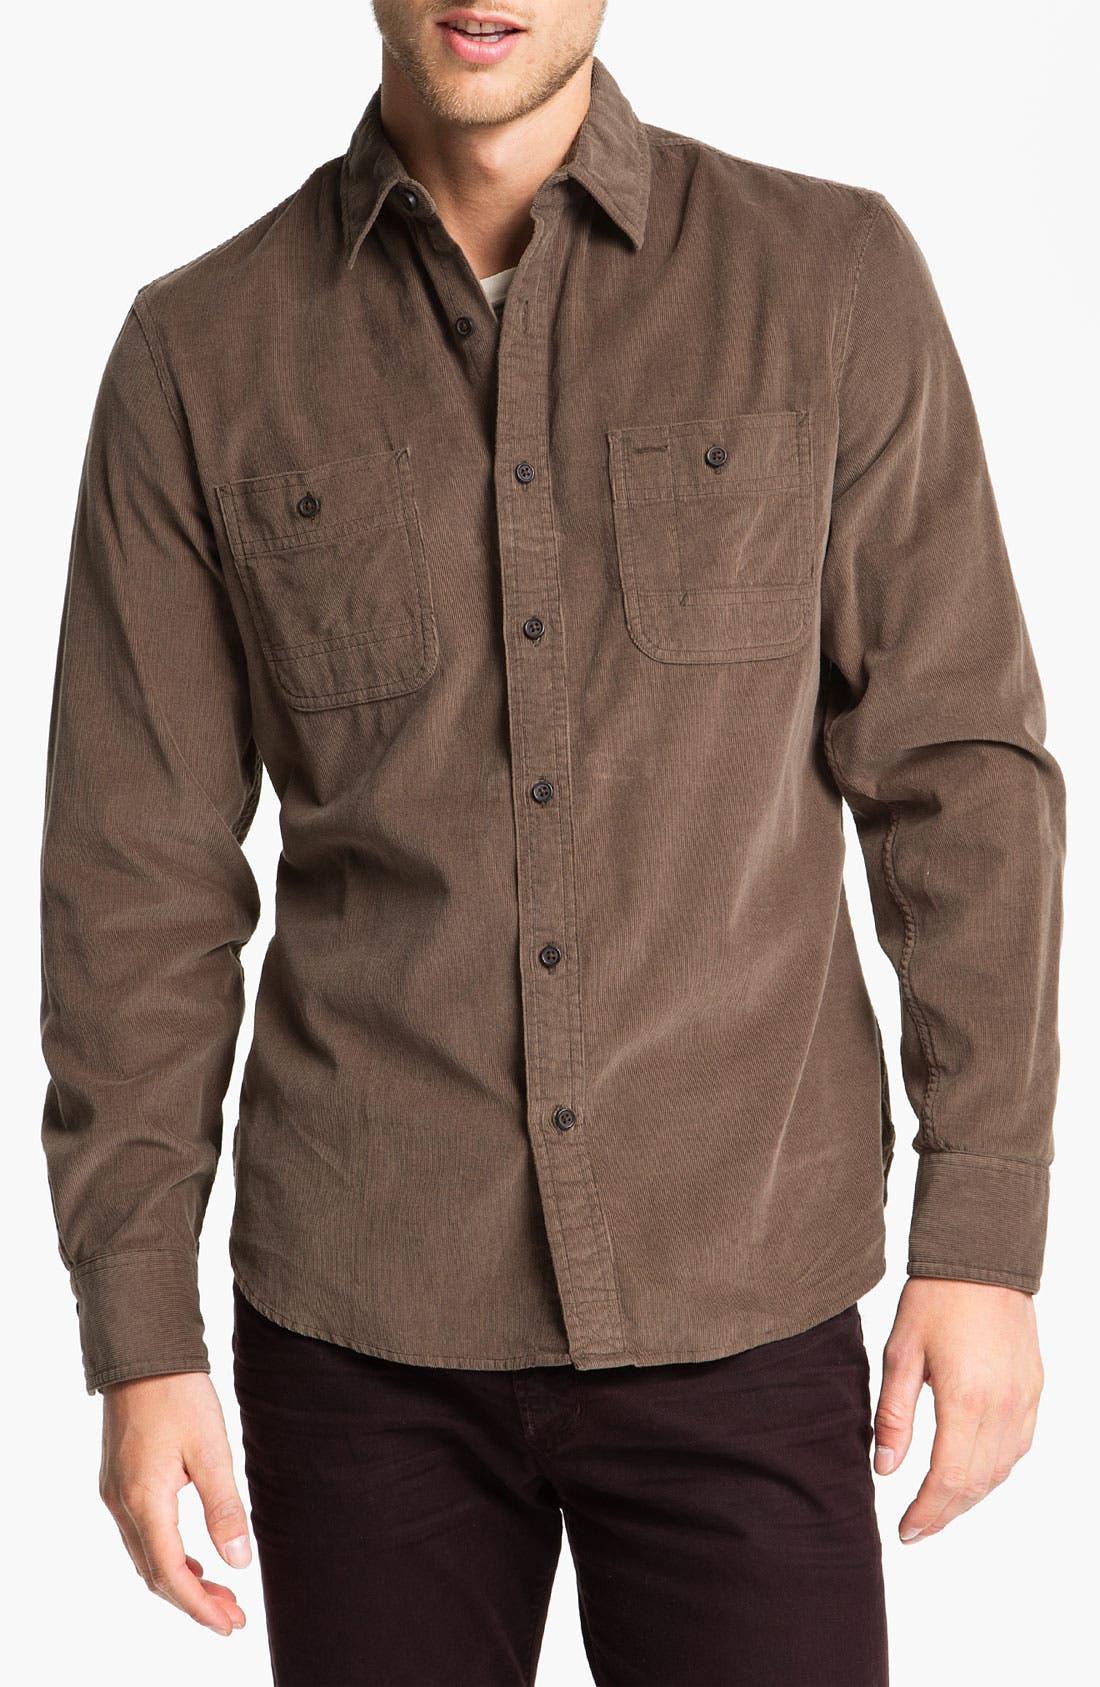 Main Image - Wallin & Bros. Corduroy Work Shirt